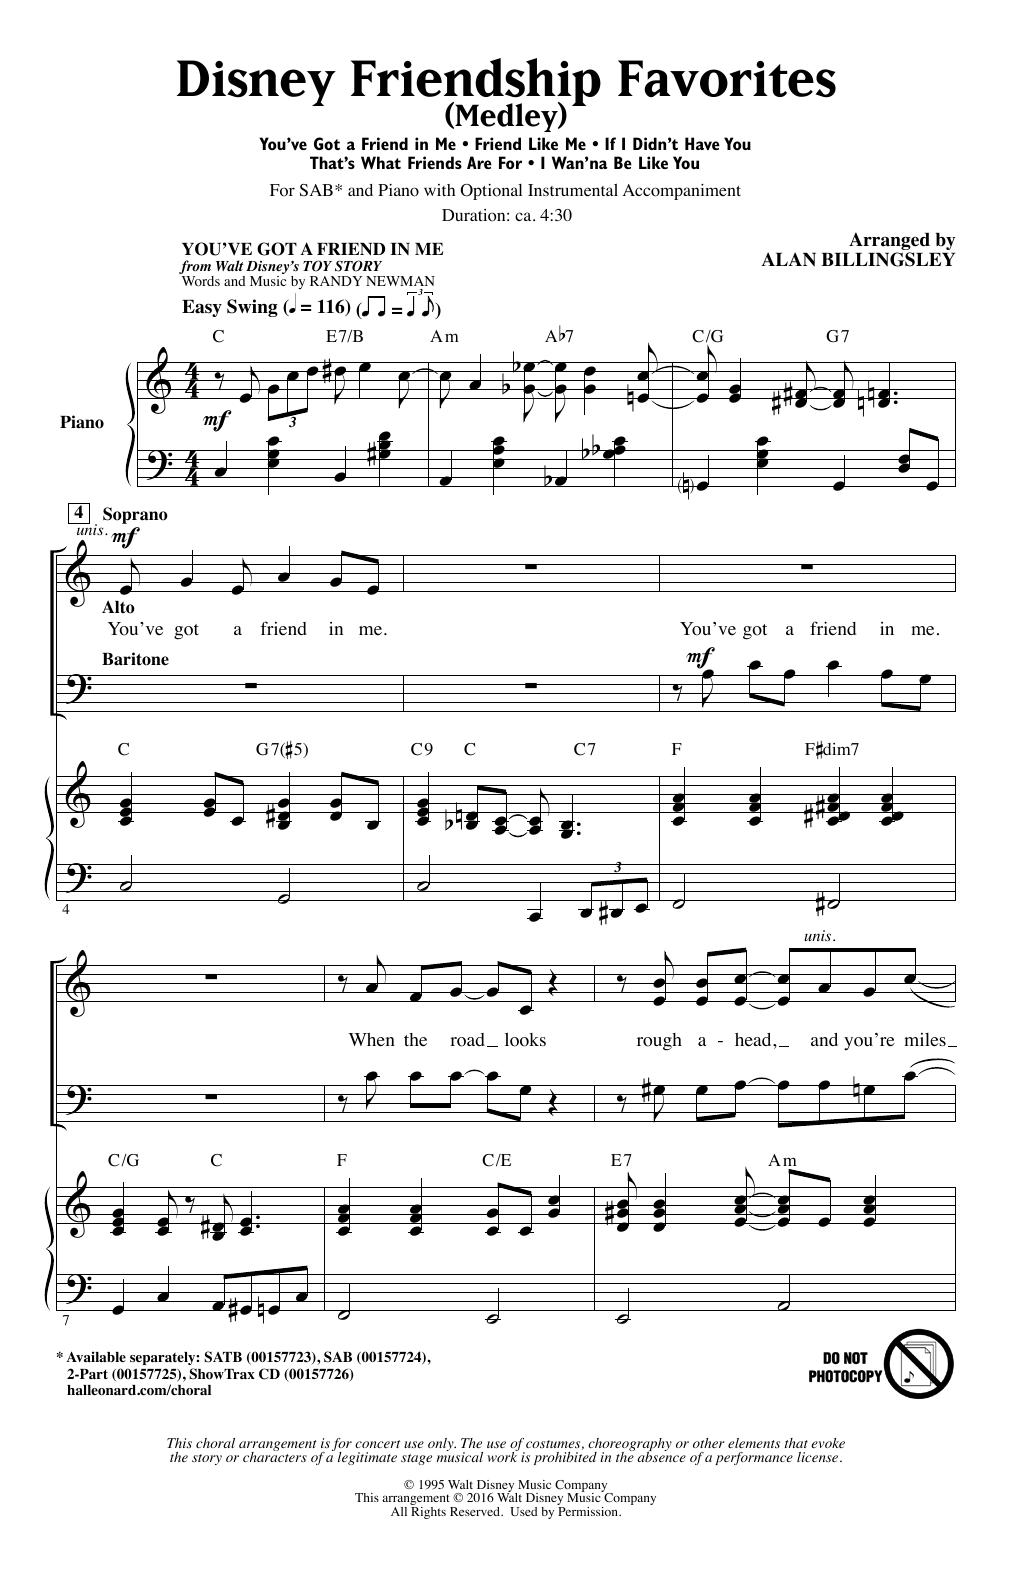 Randy Newman and Lyle Lovett - Disney Friendship Favorites (Medley)